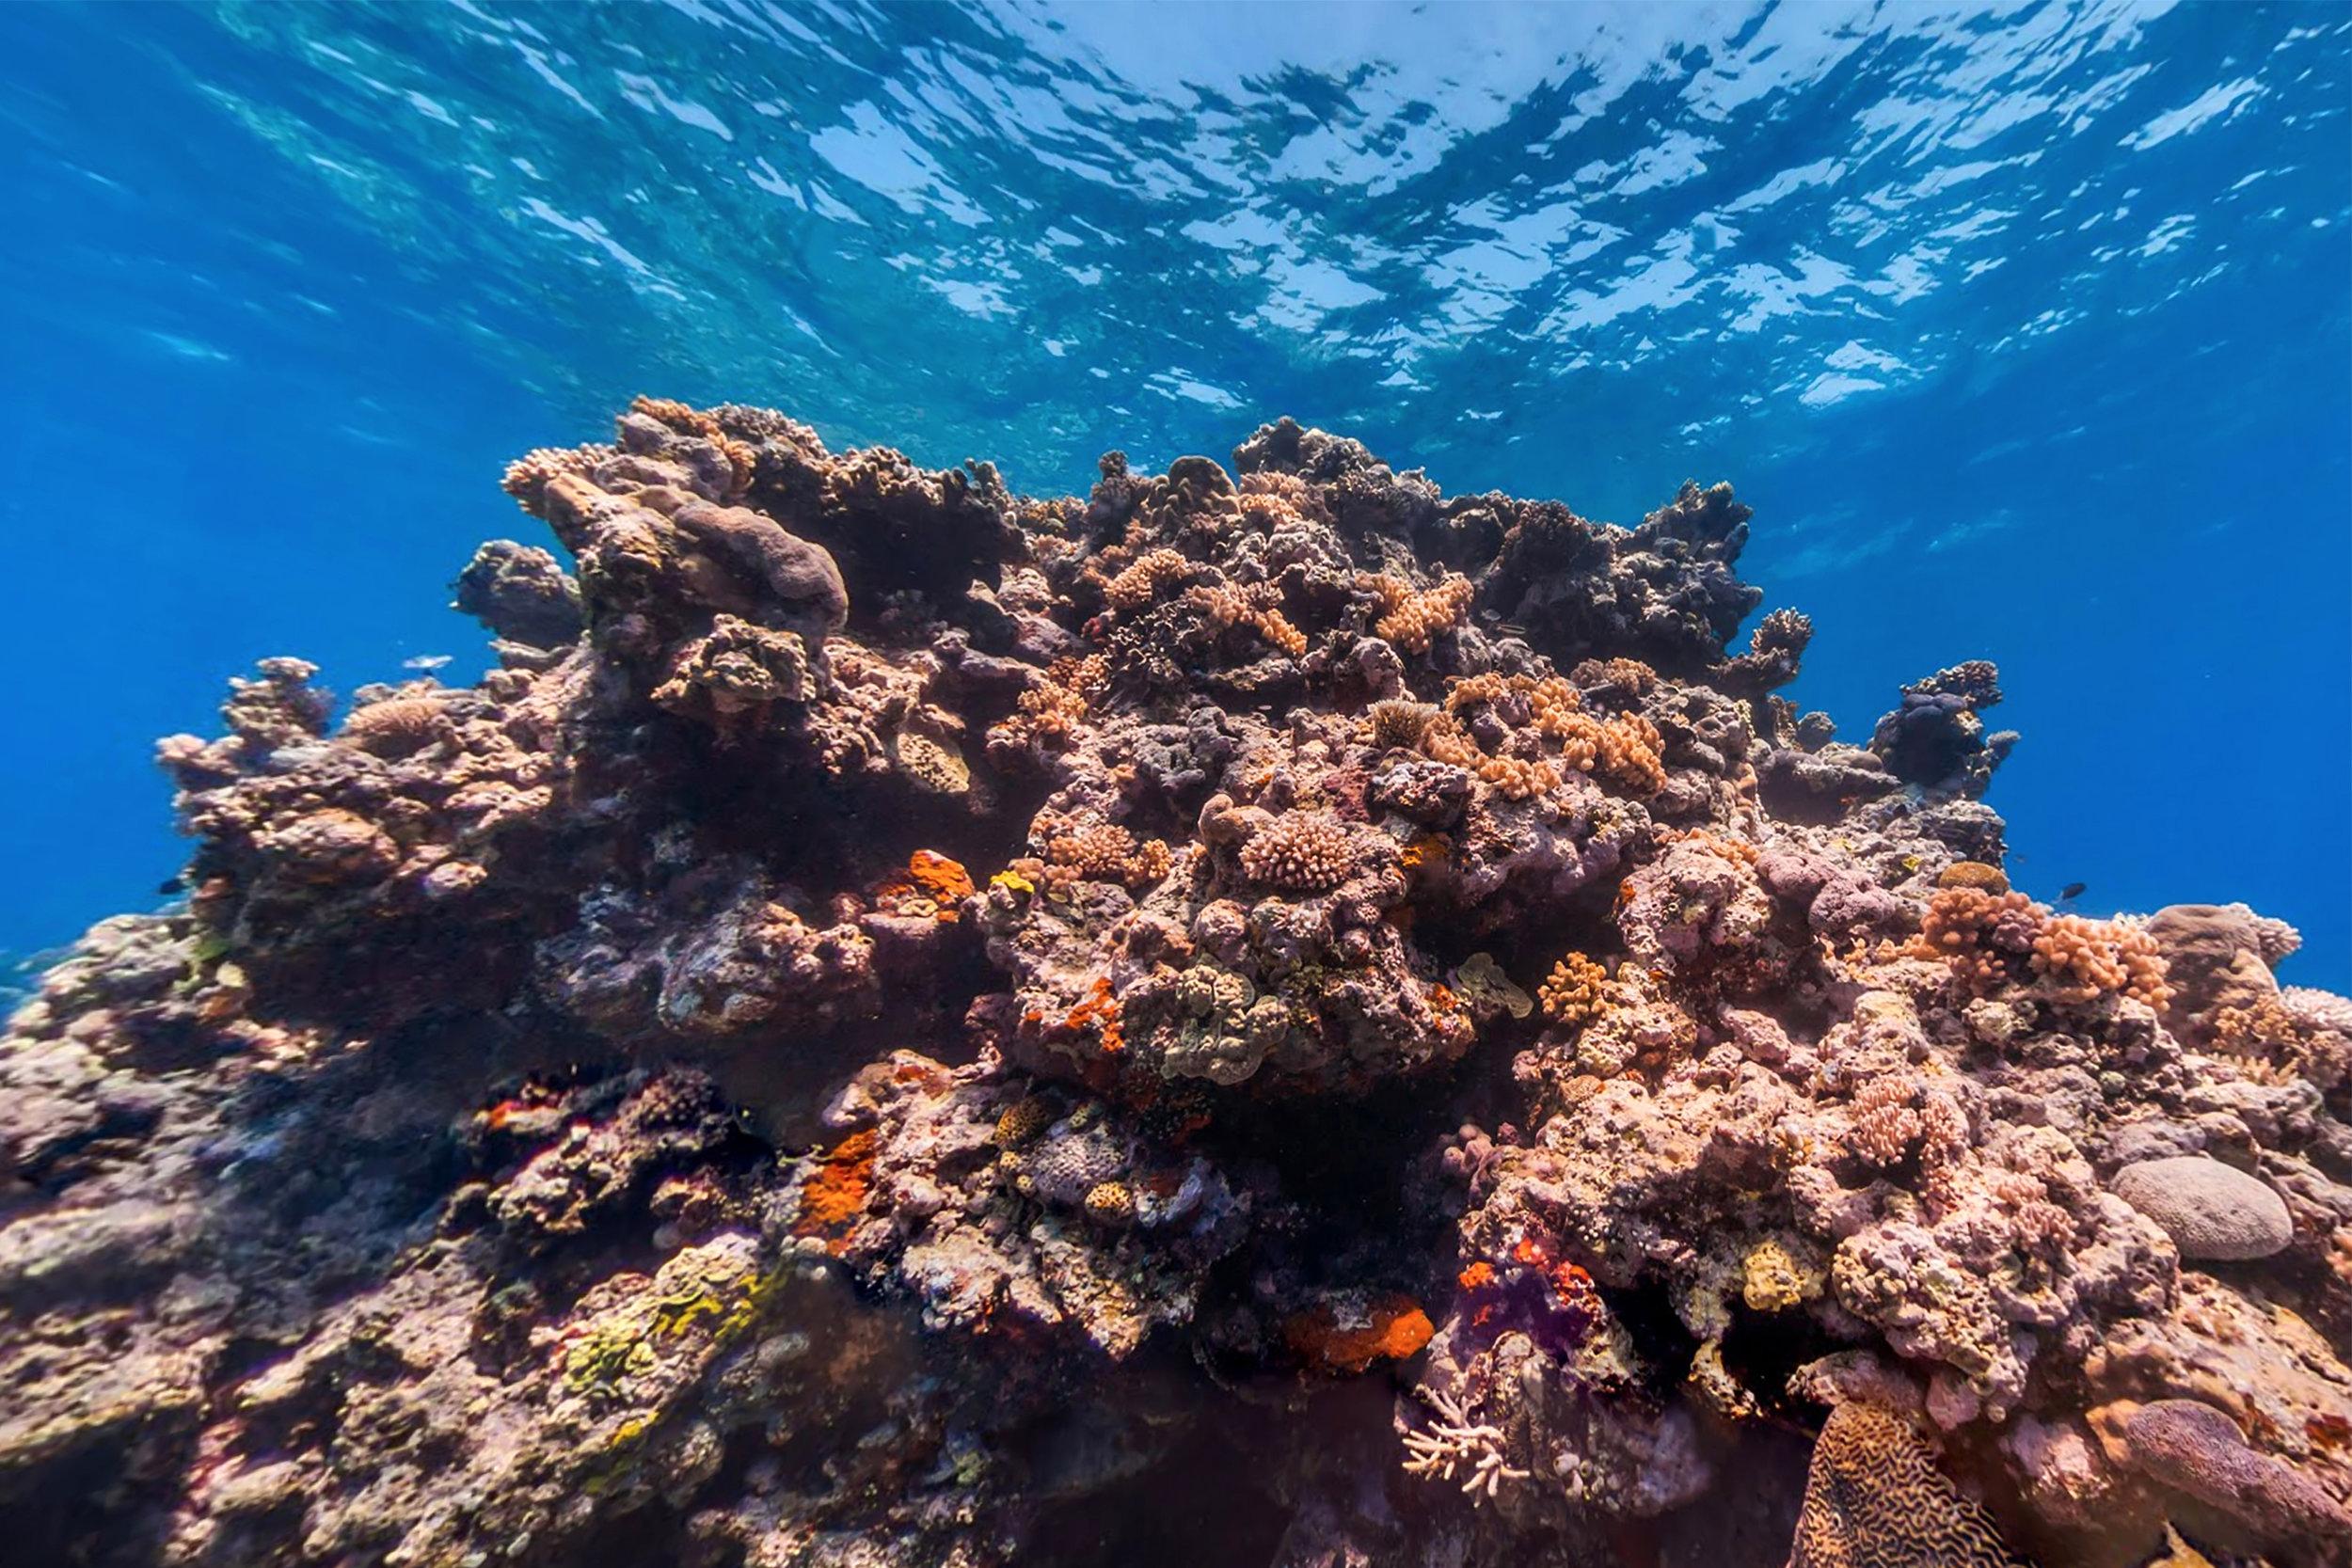 KNIFE REEF, Great barrier reef CREDIT: THE OCEAN AGENCY / XL CATLIN SEAVIEW SURVEY